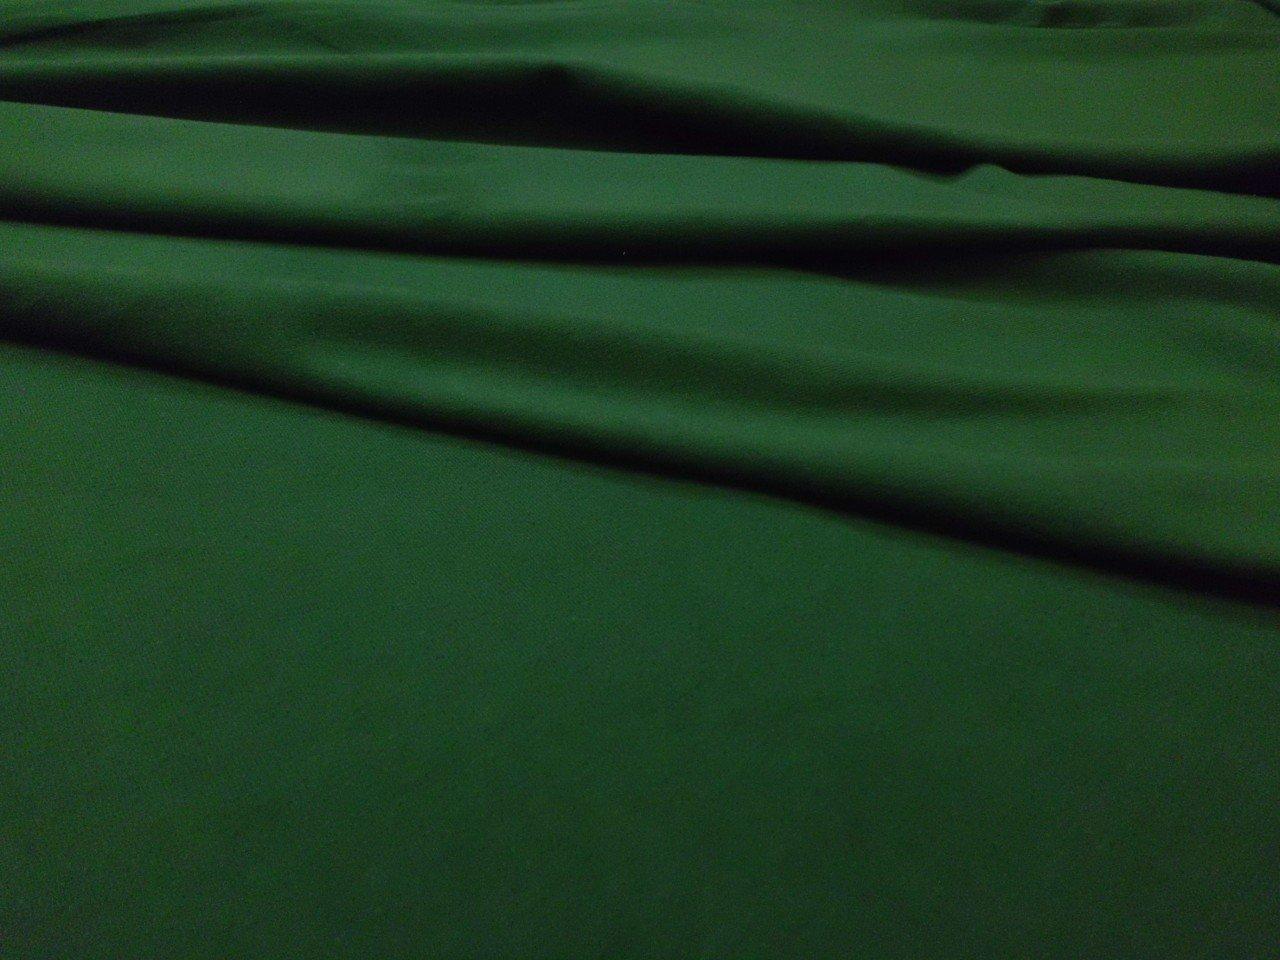 Cotton & Lycra Jersey Knit in Hunter